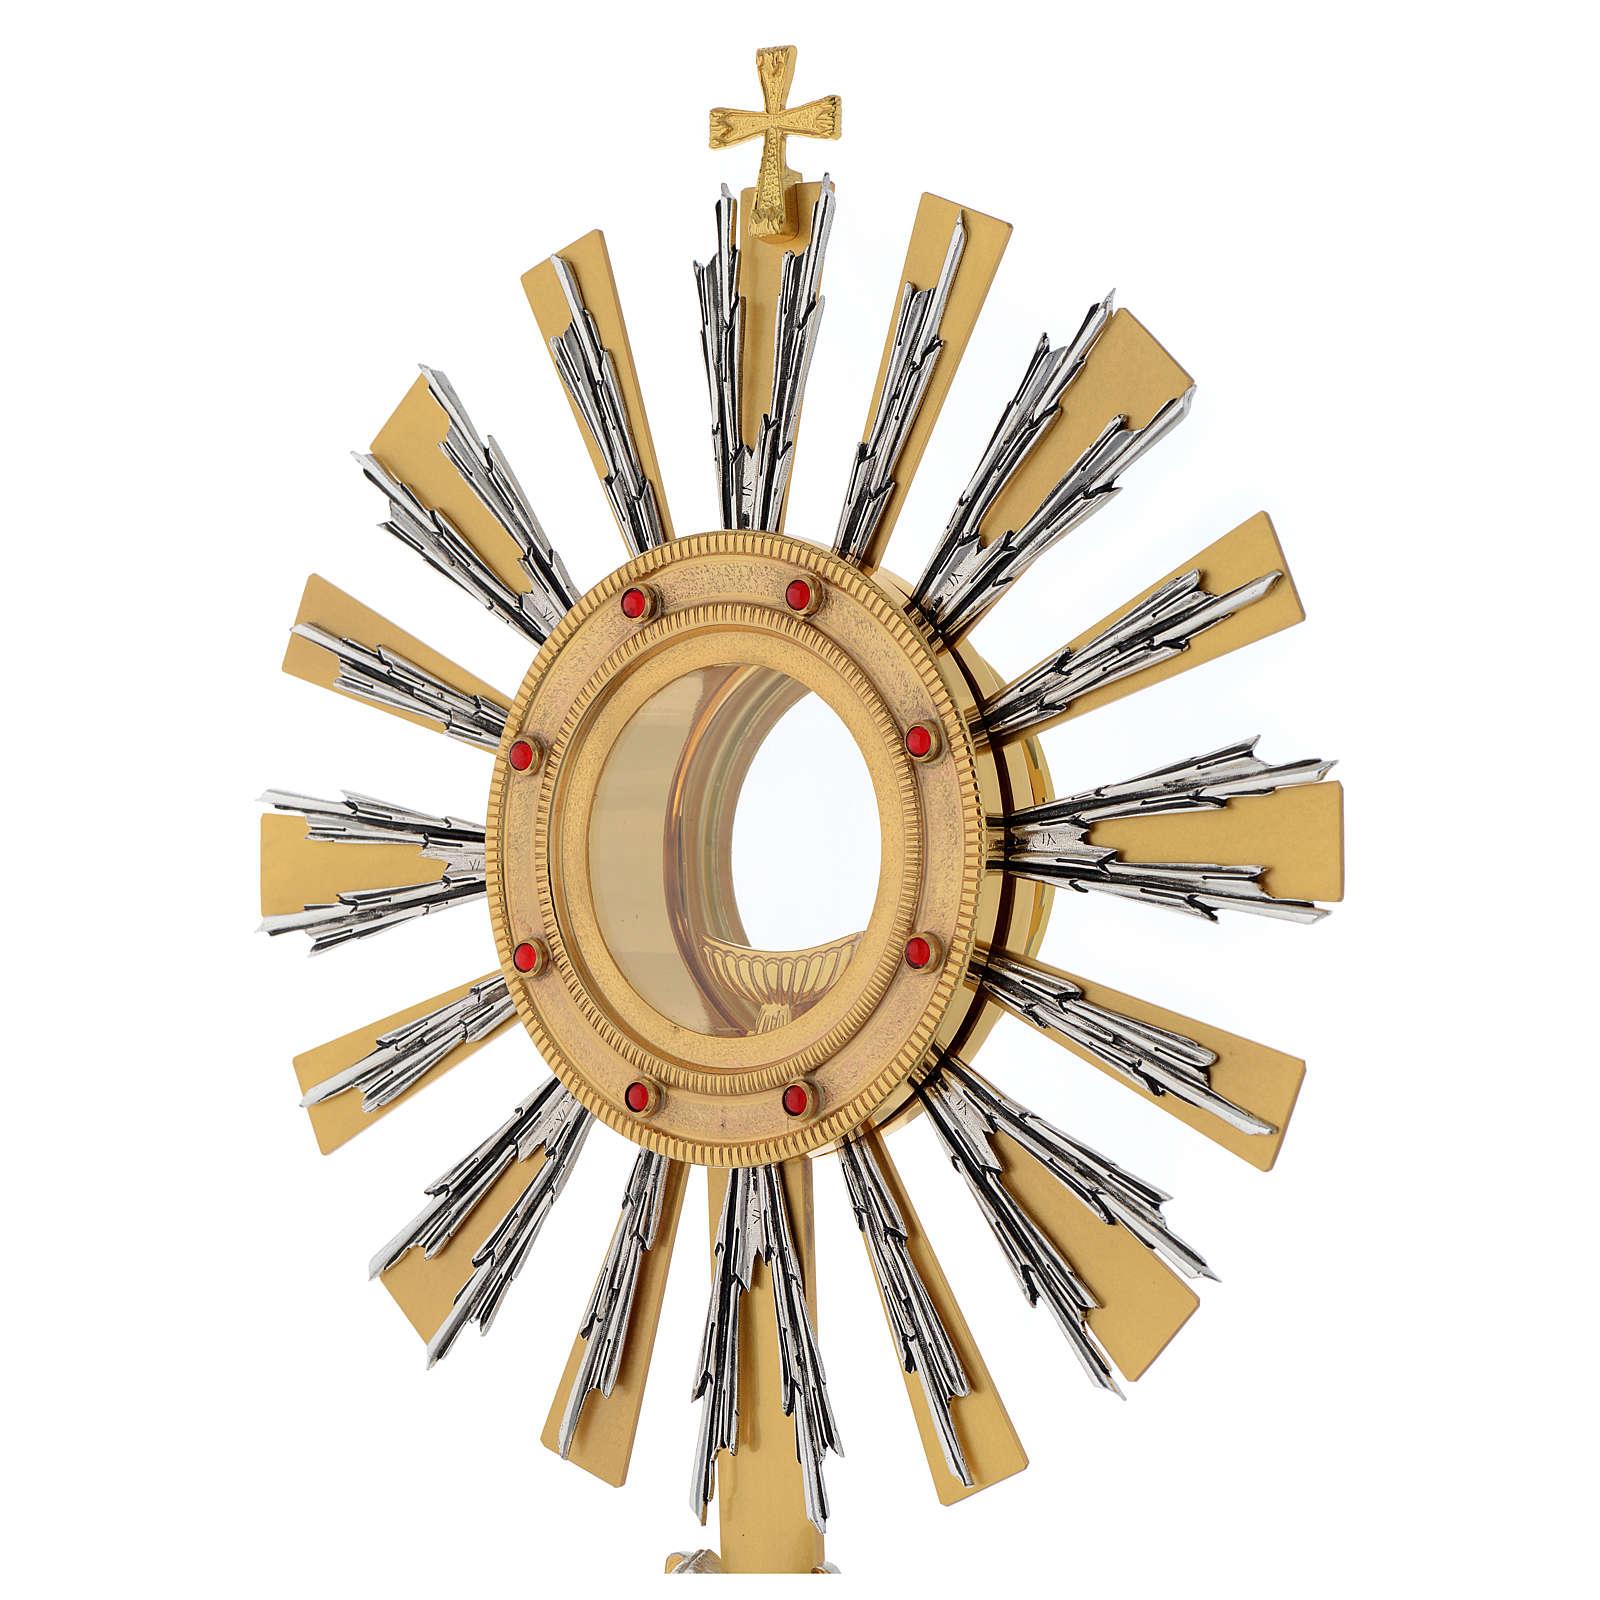 Ostensoir avec ange en prière 4